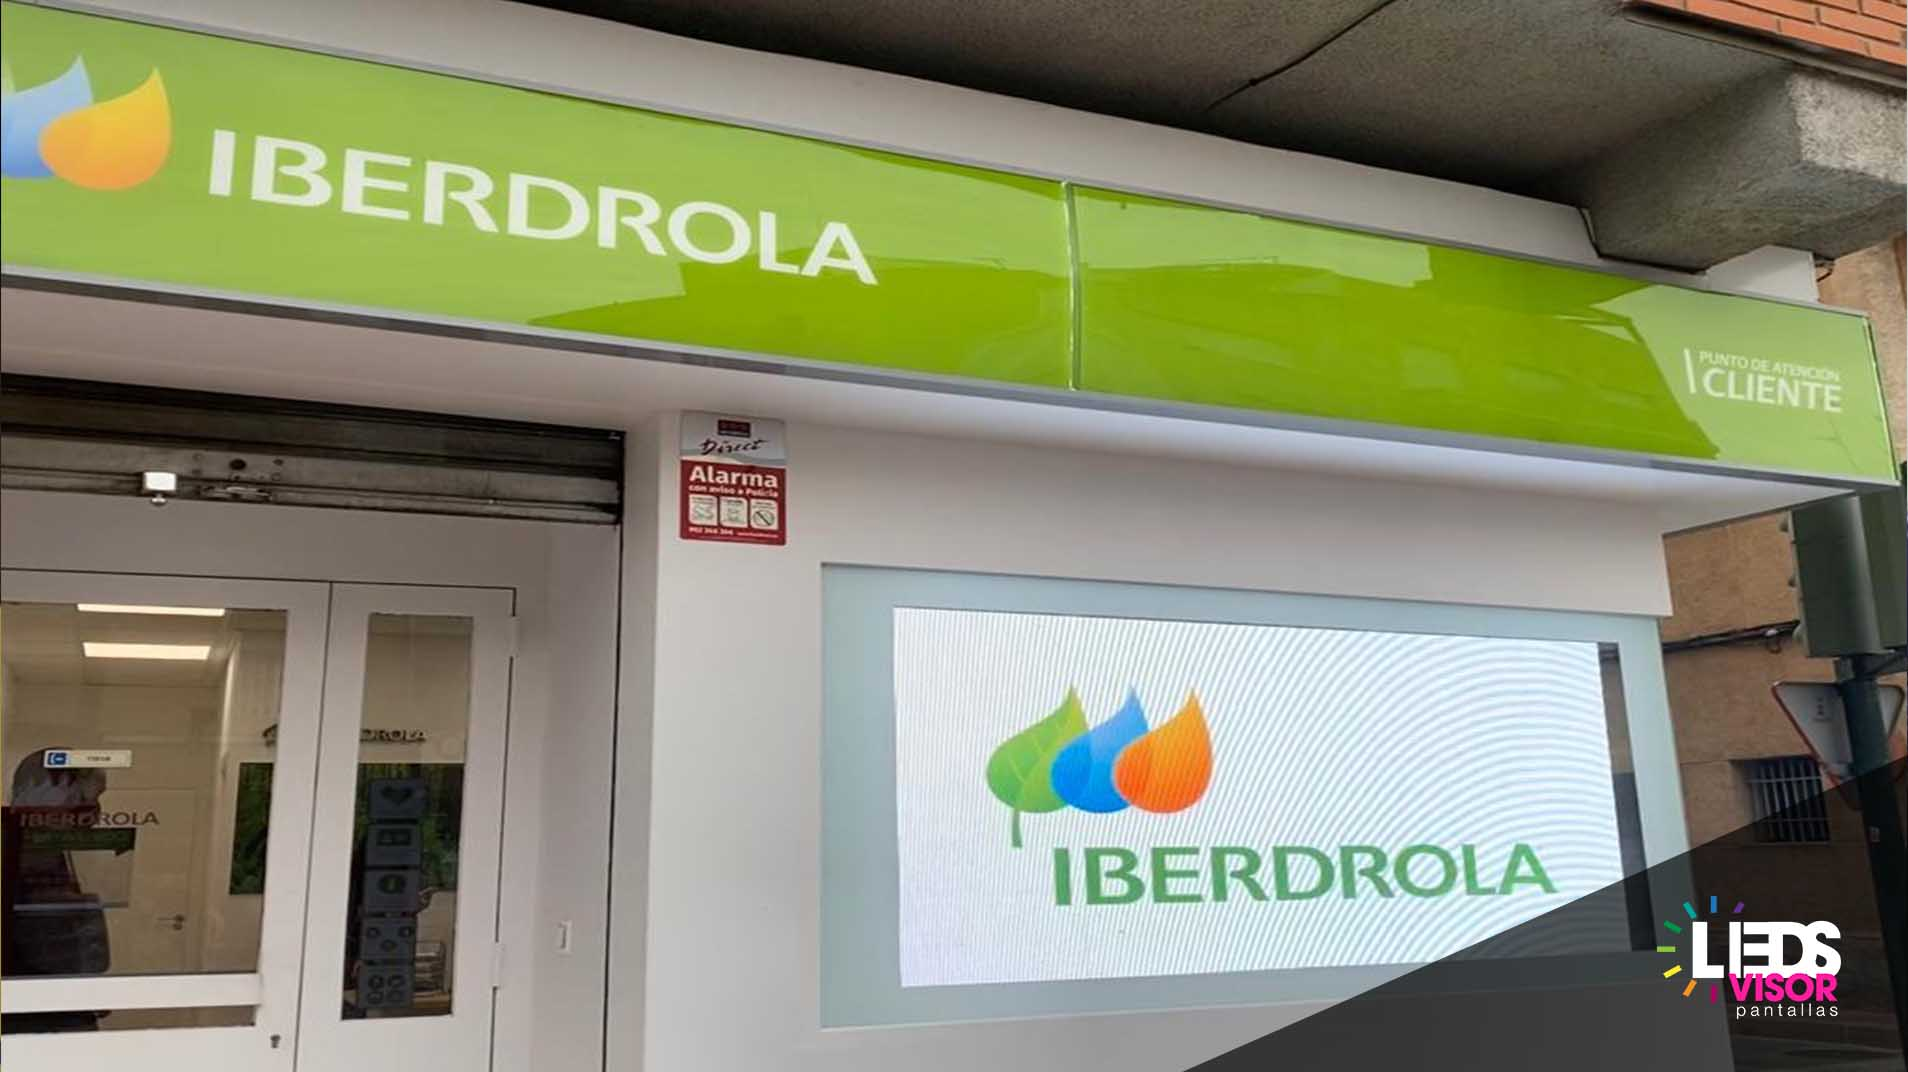 instalacion venta pantalla leds iberdrola 4 - ledsvisor